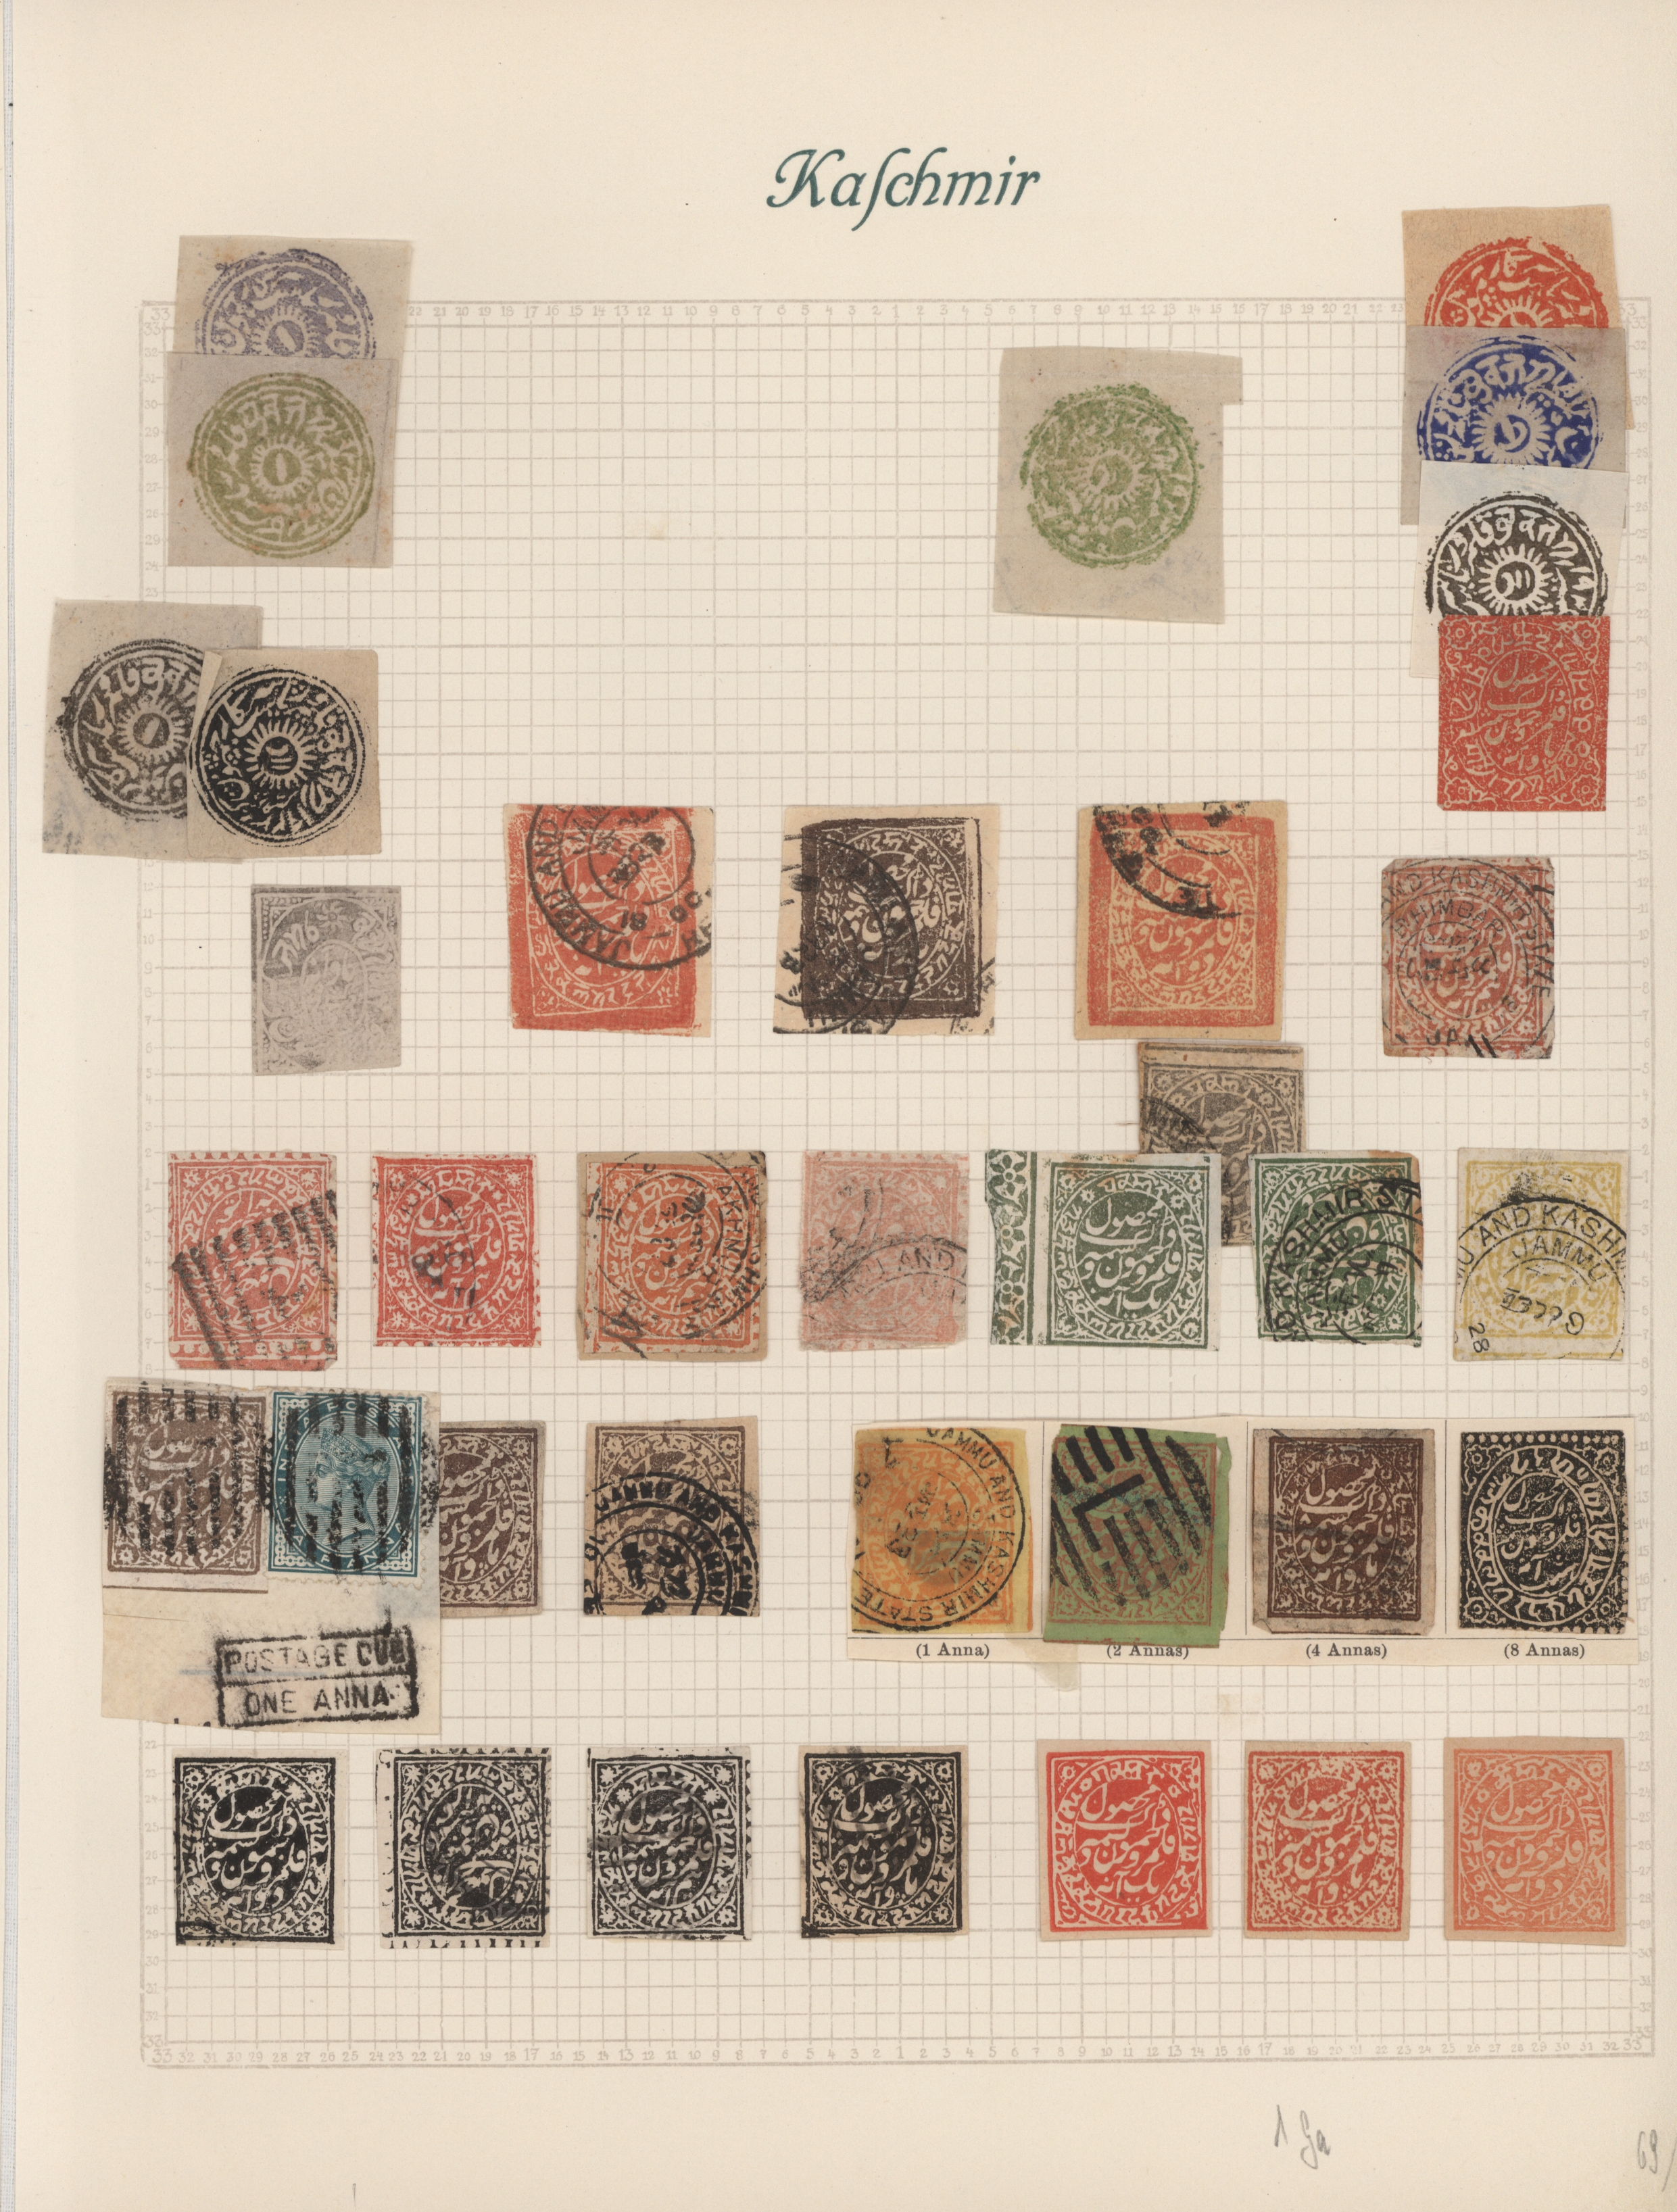 Lot 26155 - nachlässe  -  Auktionshaus Christoph Gärtner GmbH & Co. KG Sale #46 Gollcetions Germany - including the suplement